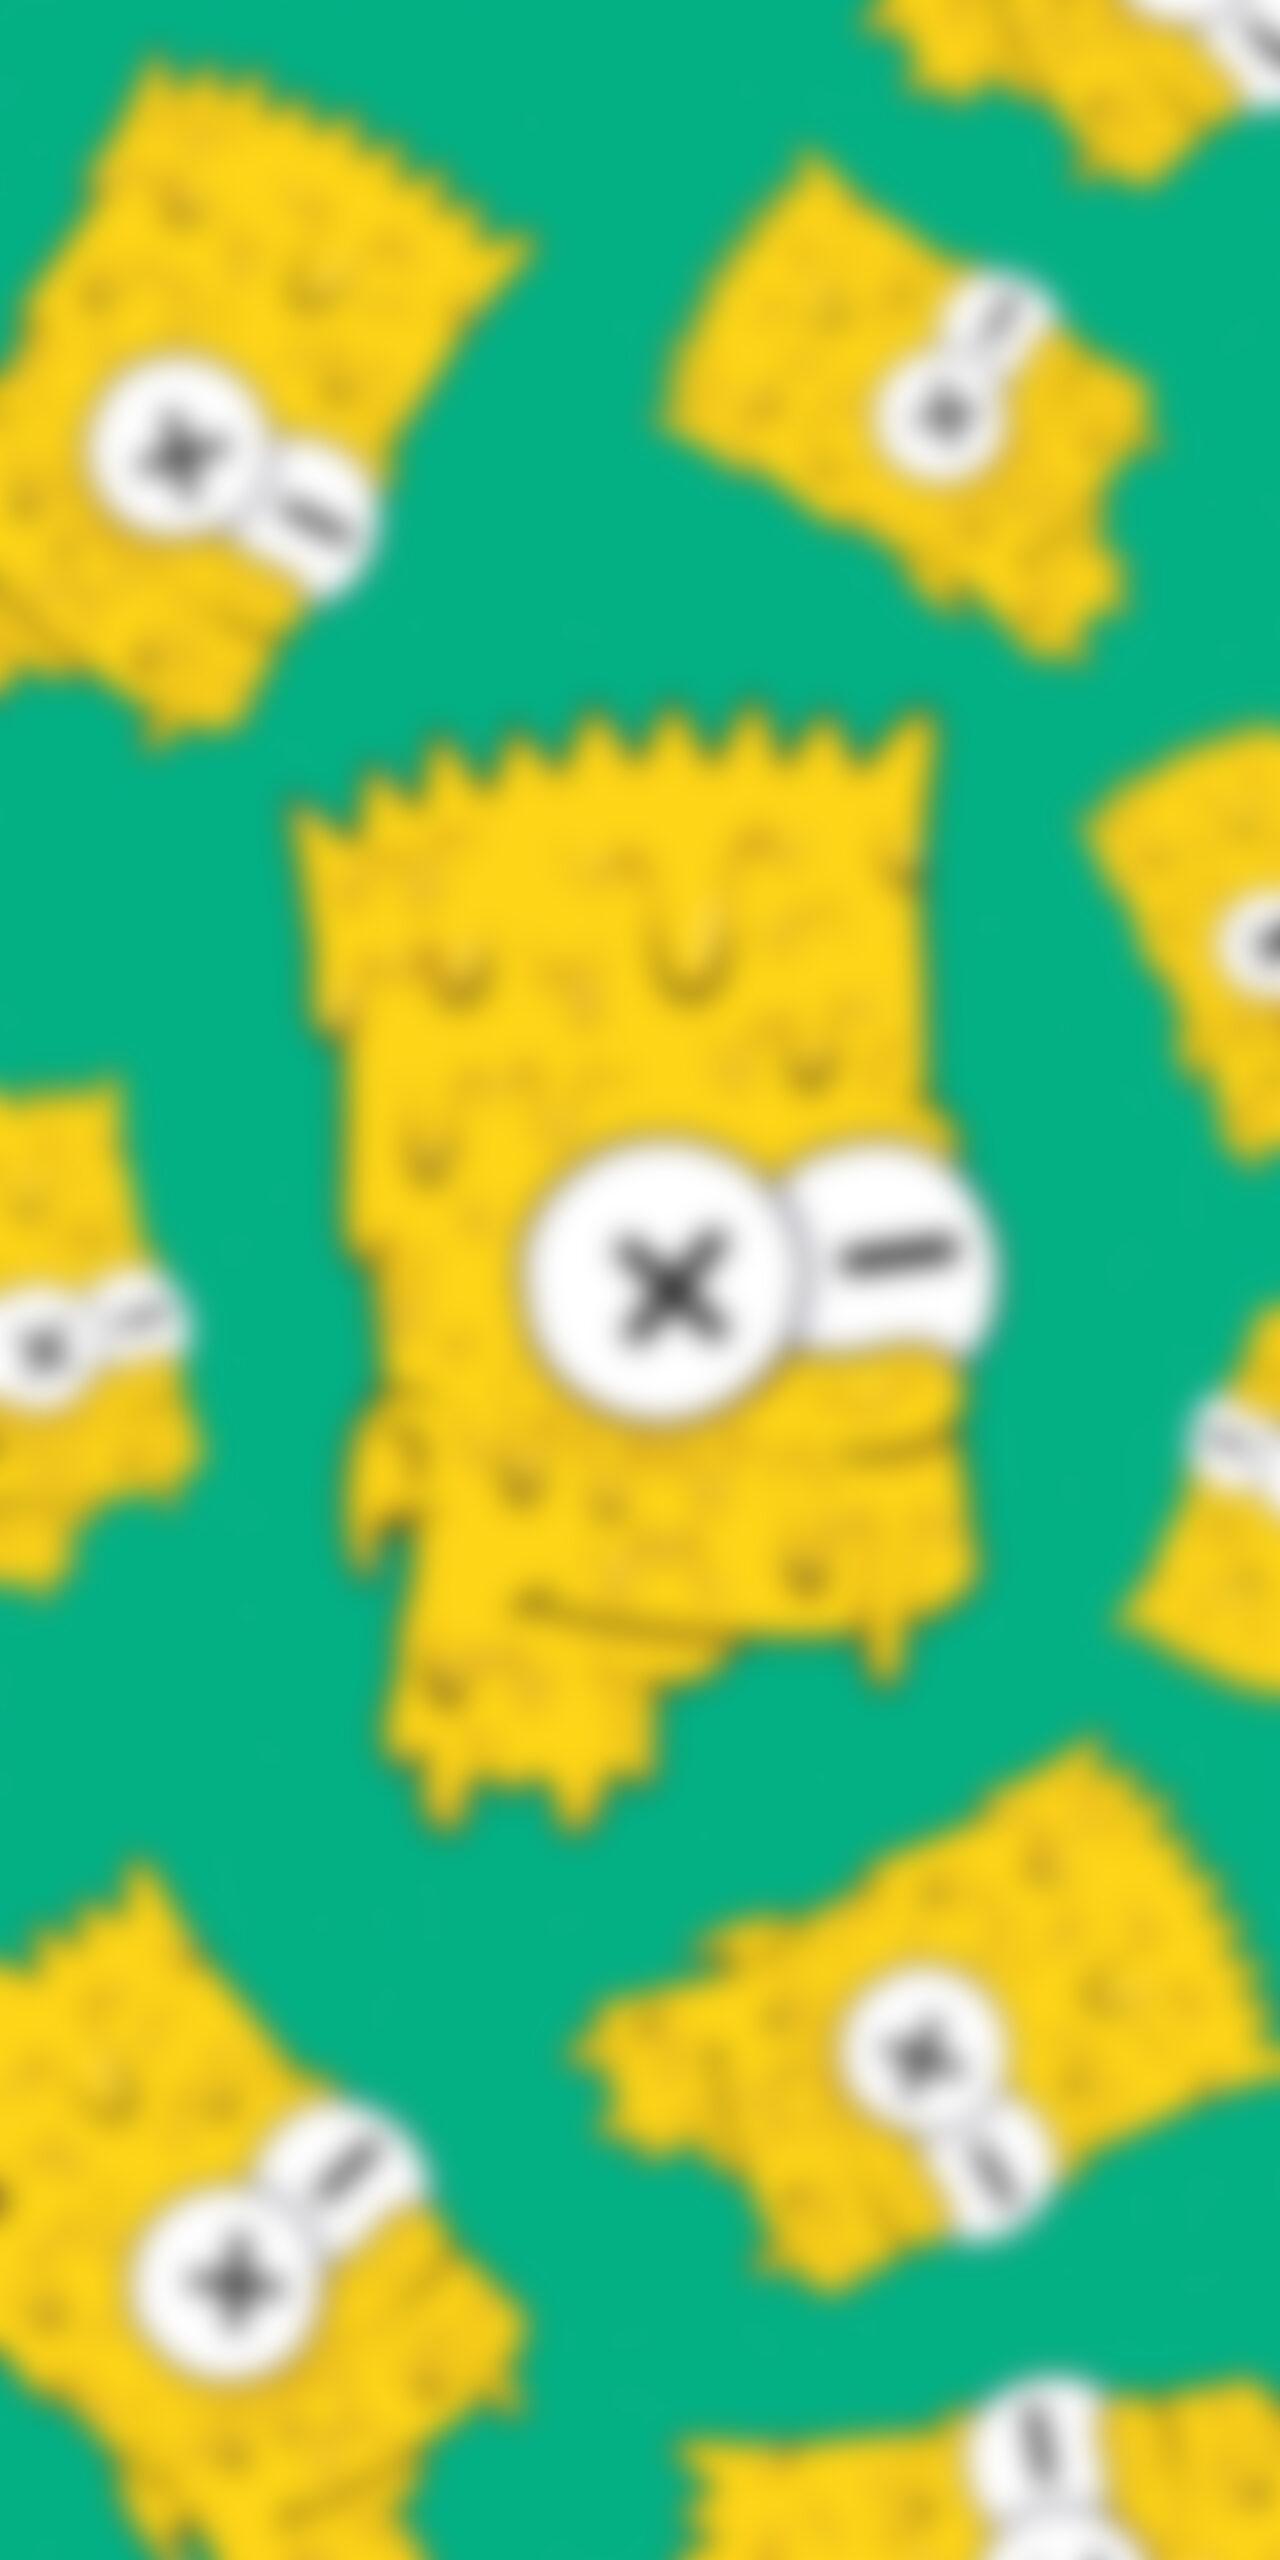 bart simpson drip face locked blur wallpaper